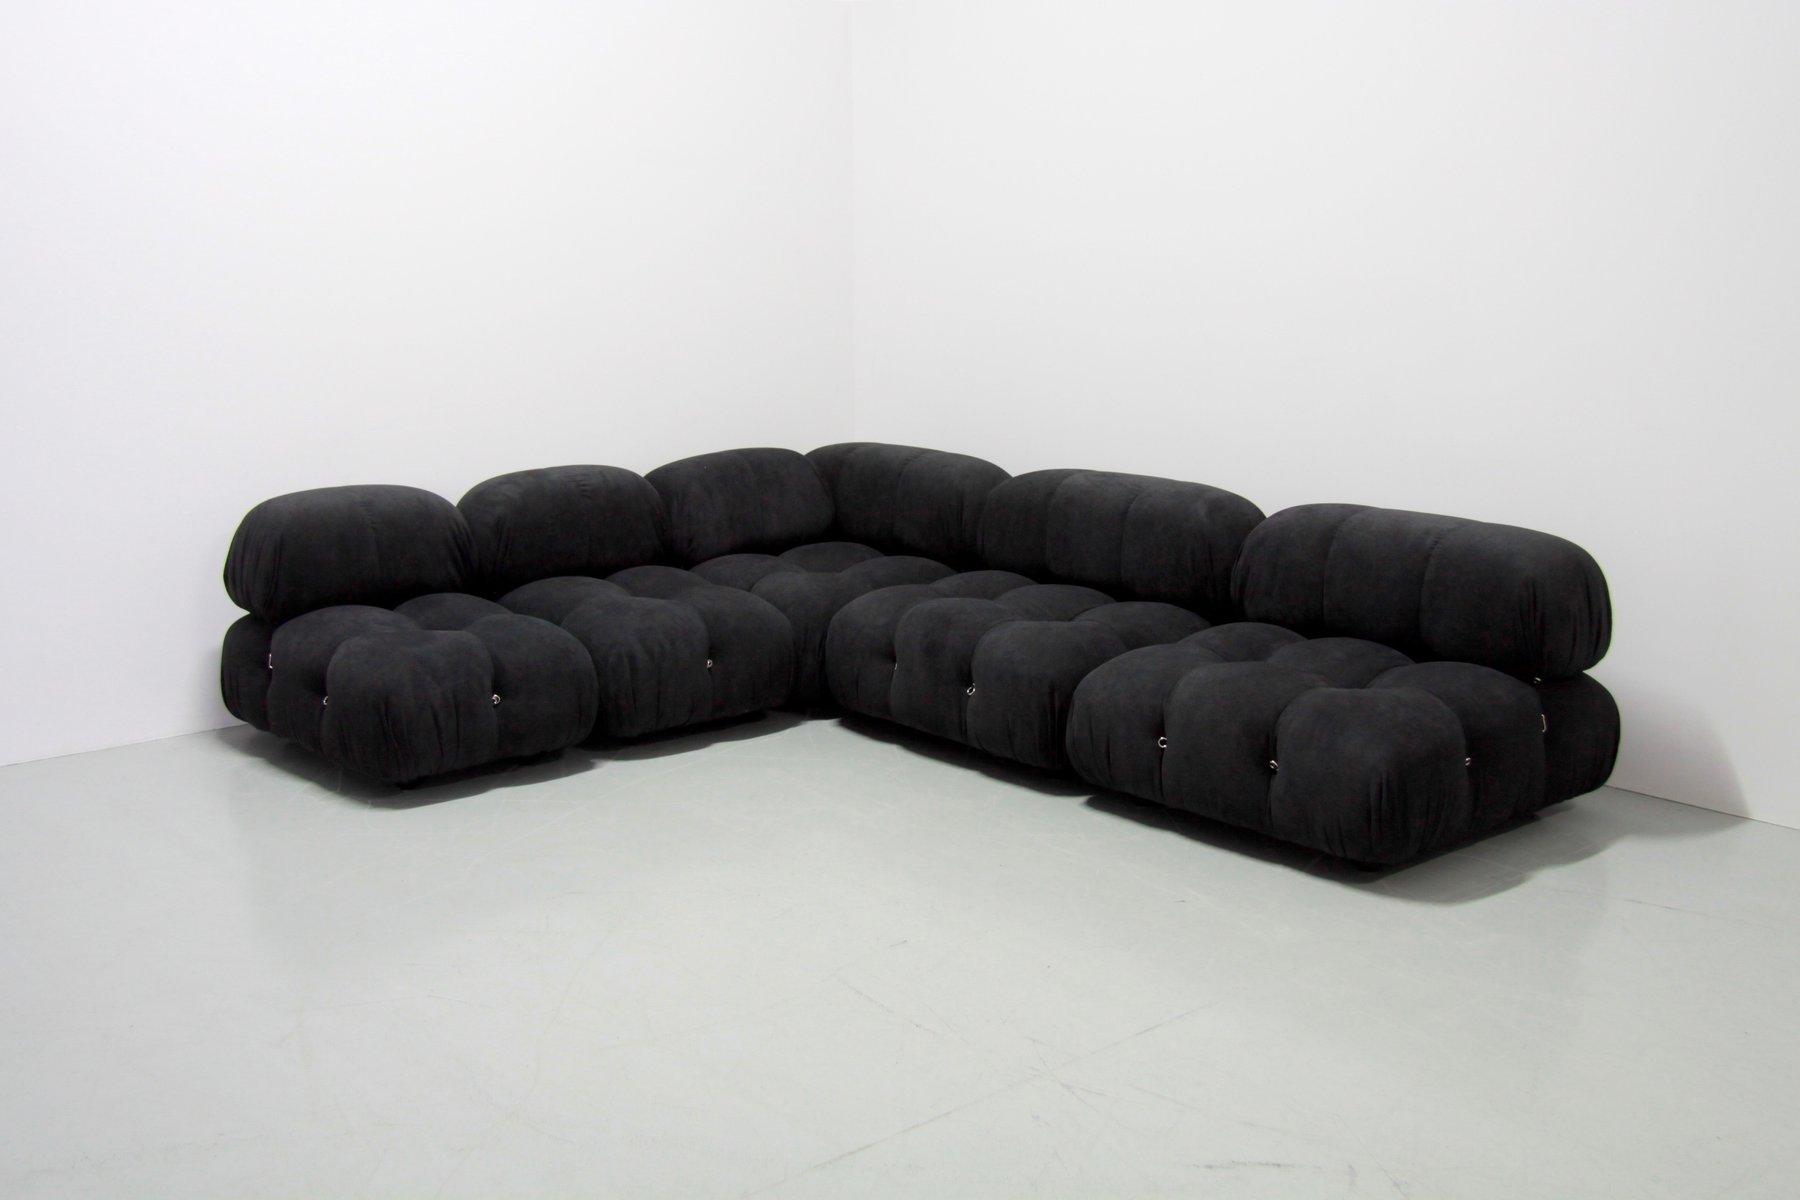 Vintage Black Camaleonda Sofa With 5 Elements By Mario Bellini For C B Italia